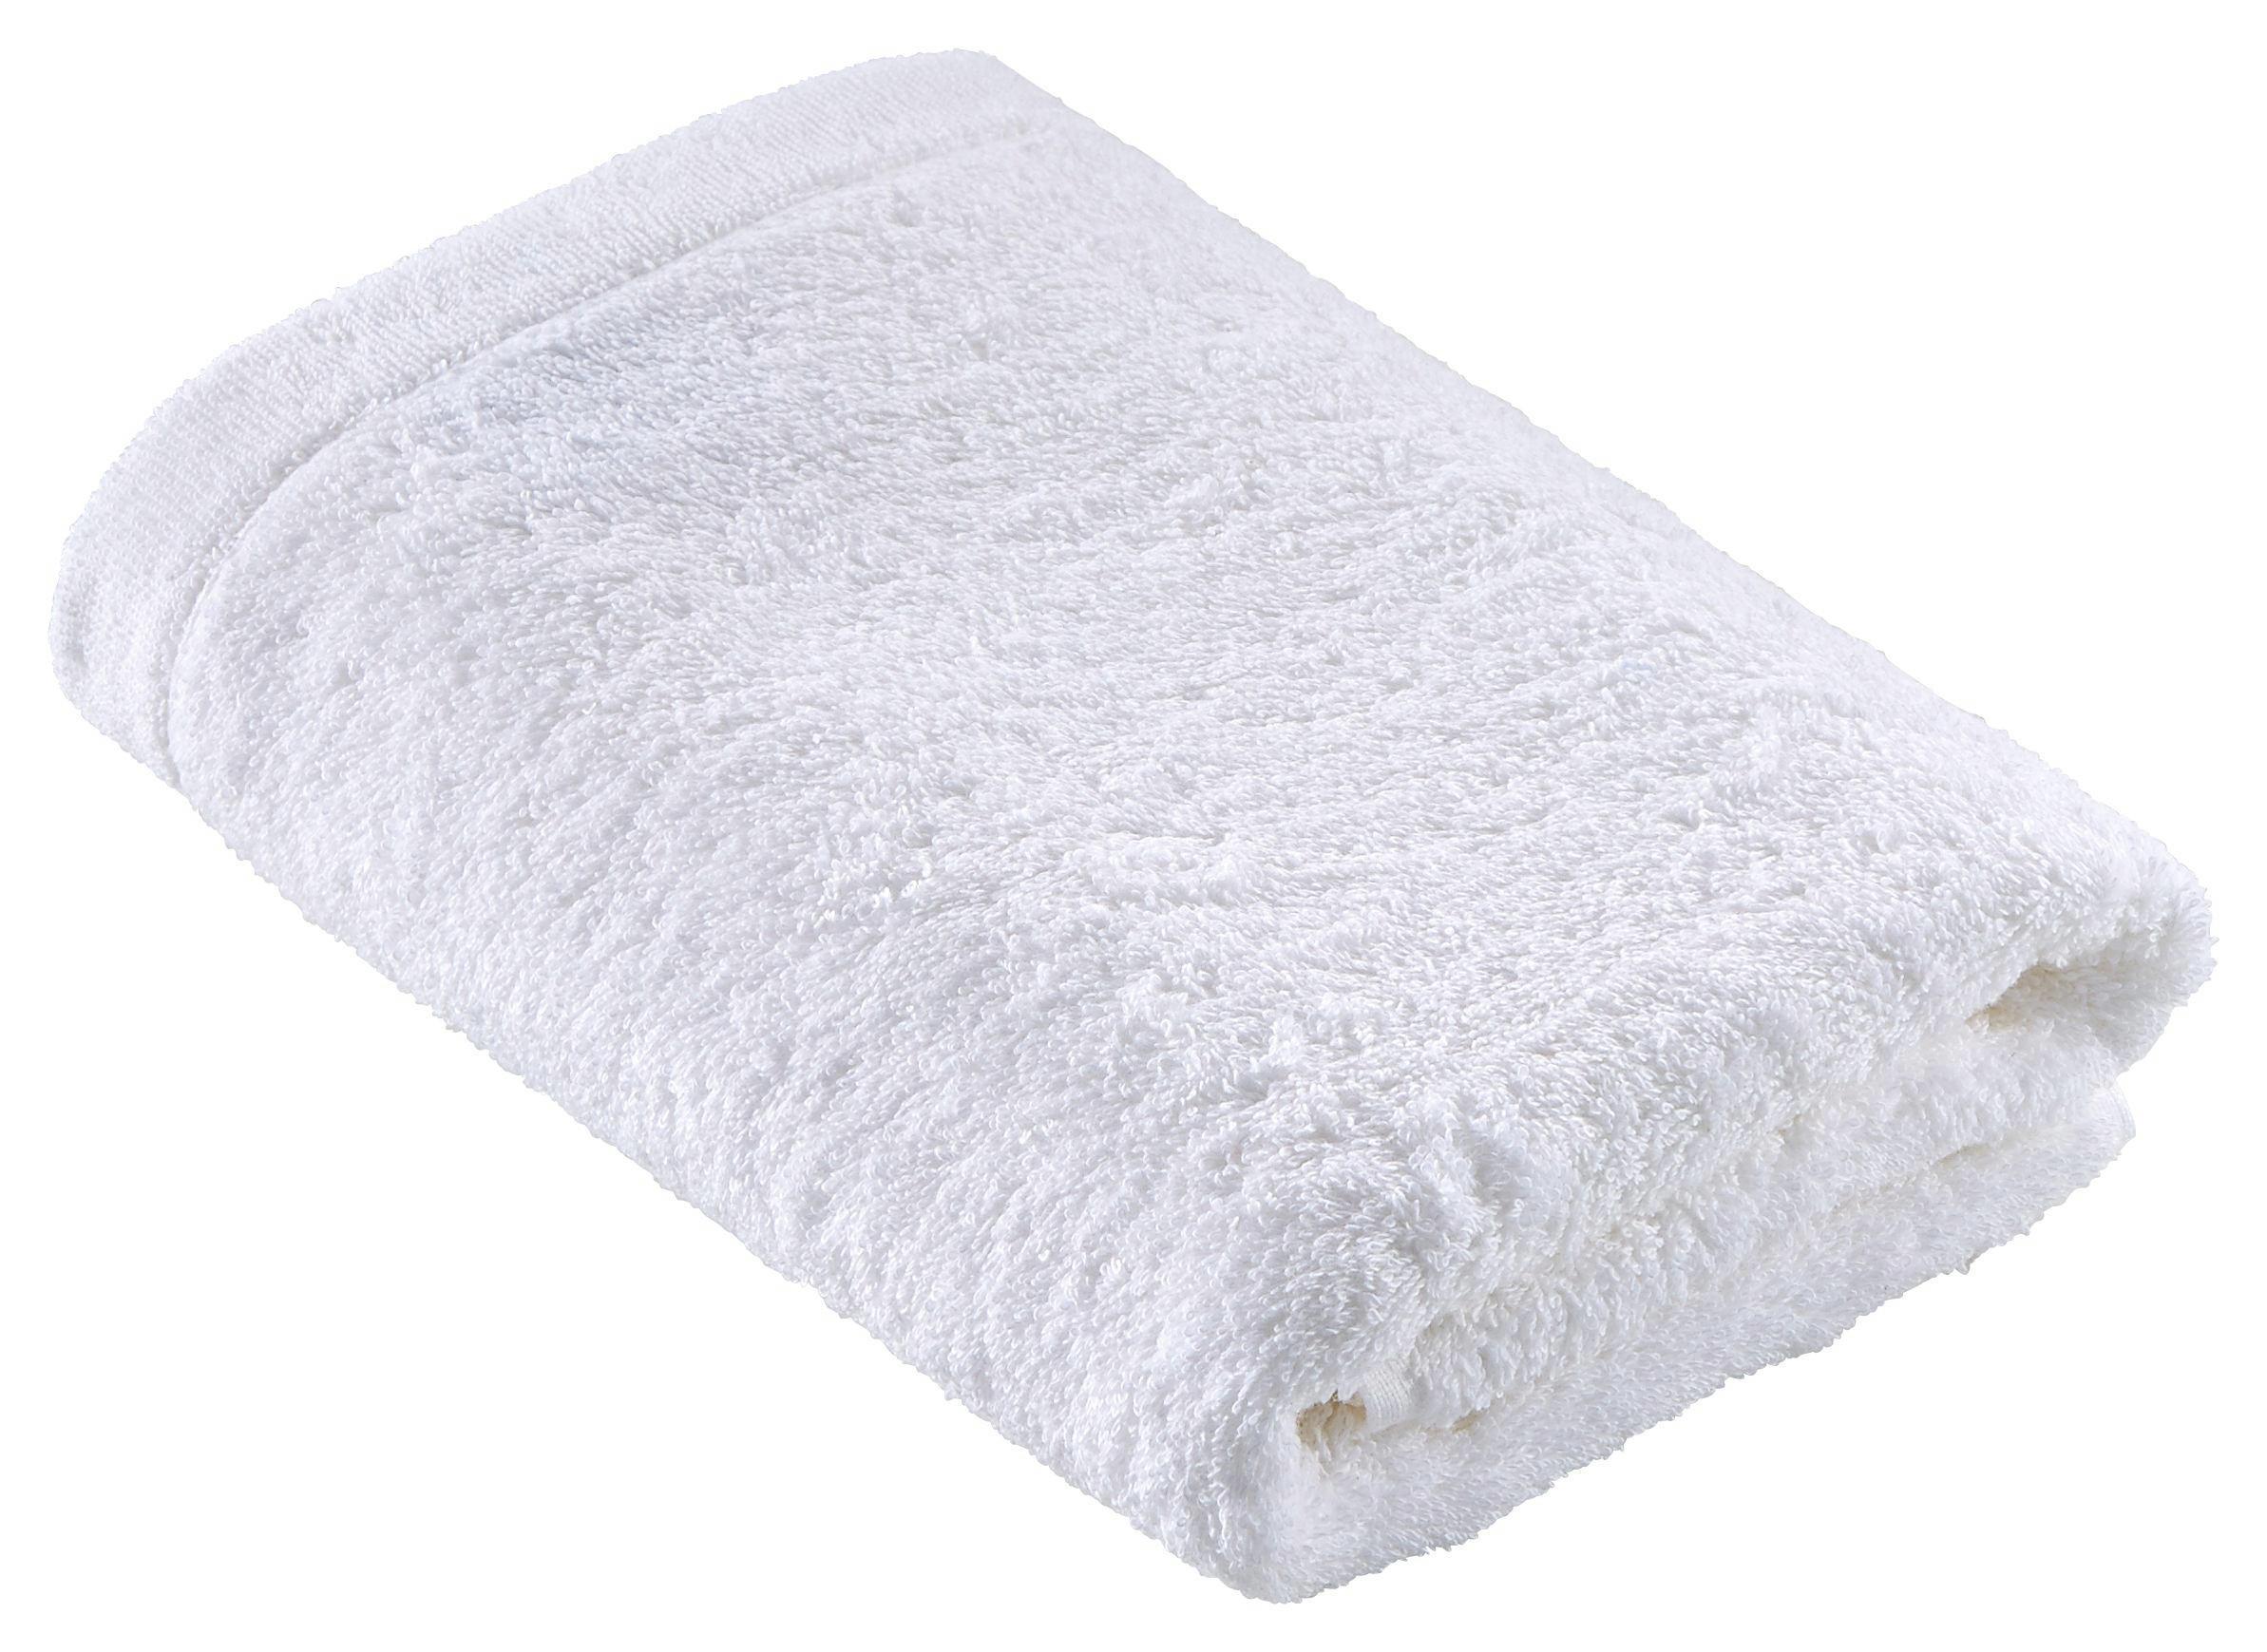 DUSCHTUCH 70/140 cm - Weiß, Basics, Textil (70/140cm) - CAWOE